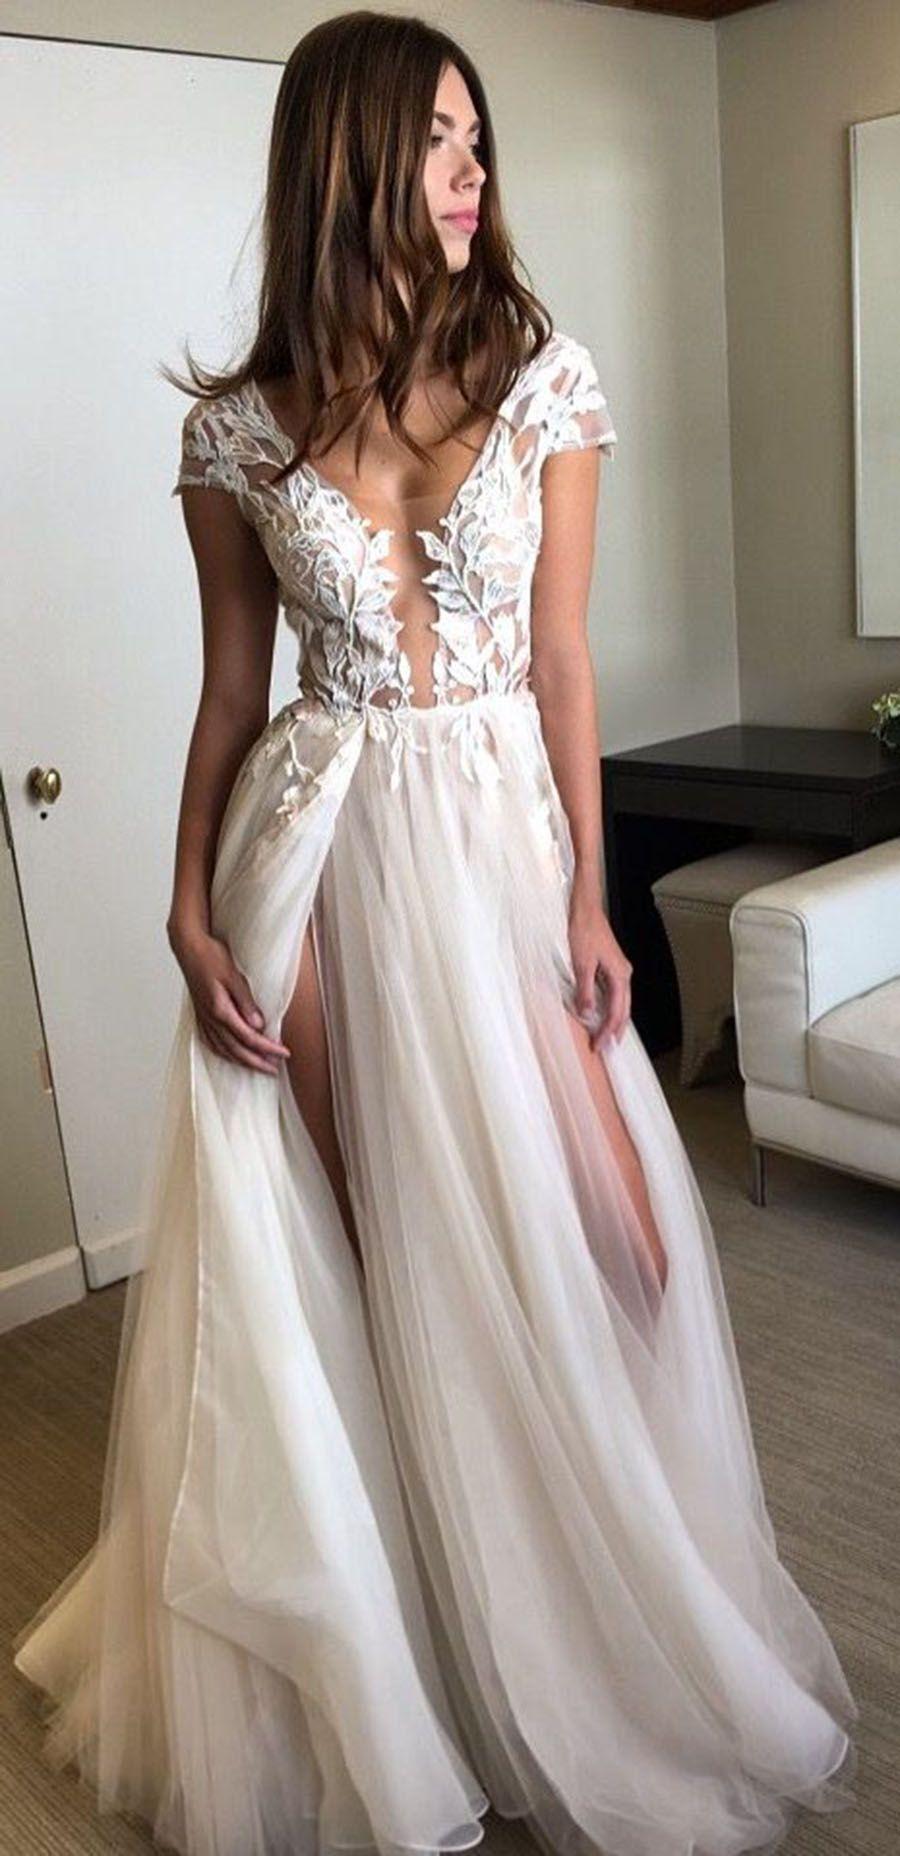 Famous wedding dresses  Muse Bertaus New Bridal Line  Dresses  Pinterest  Boda